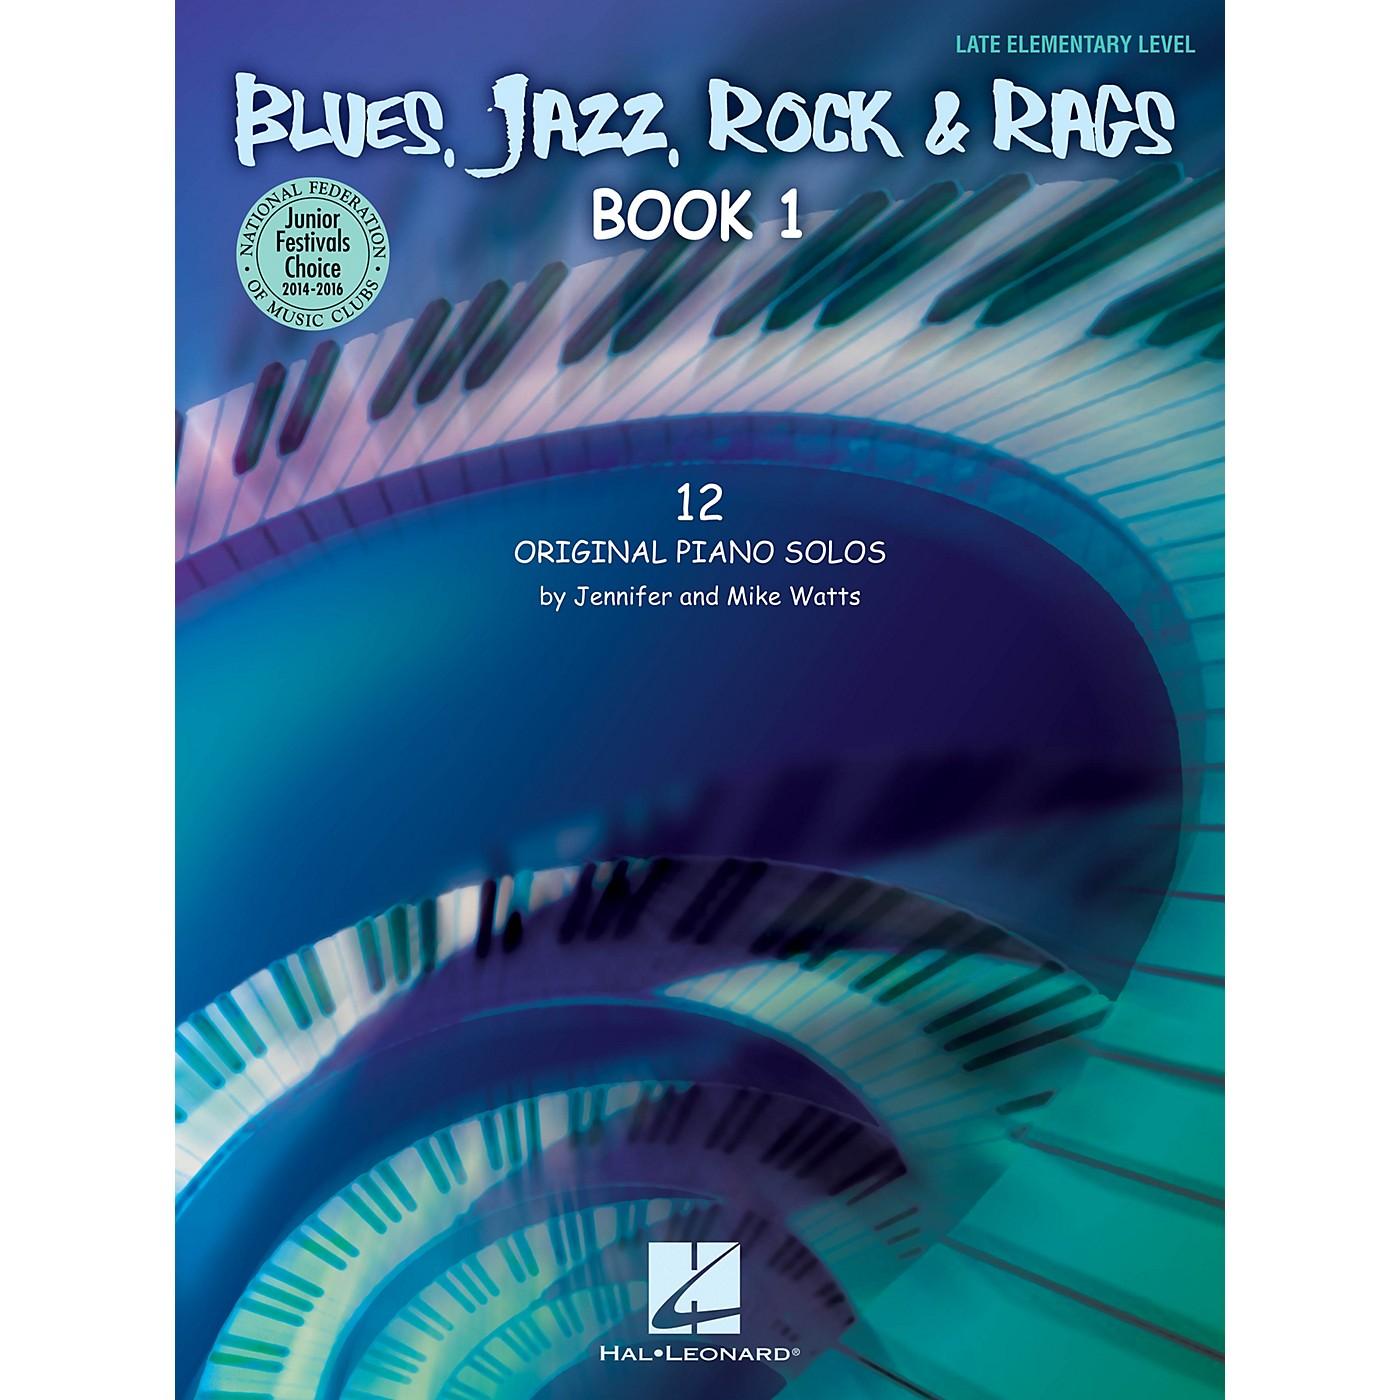 Hal Leonard Blues, Jazz, Rock & Rags - Book 1 Educational Piano Solo Series Book by Jennifer Watts (Level Late Elem) thumbnail